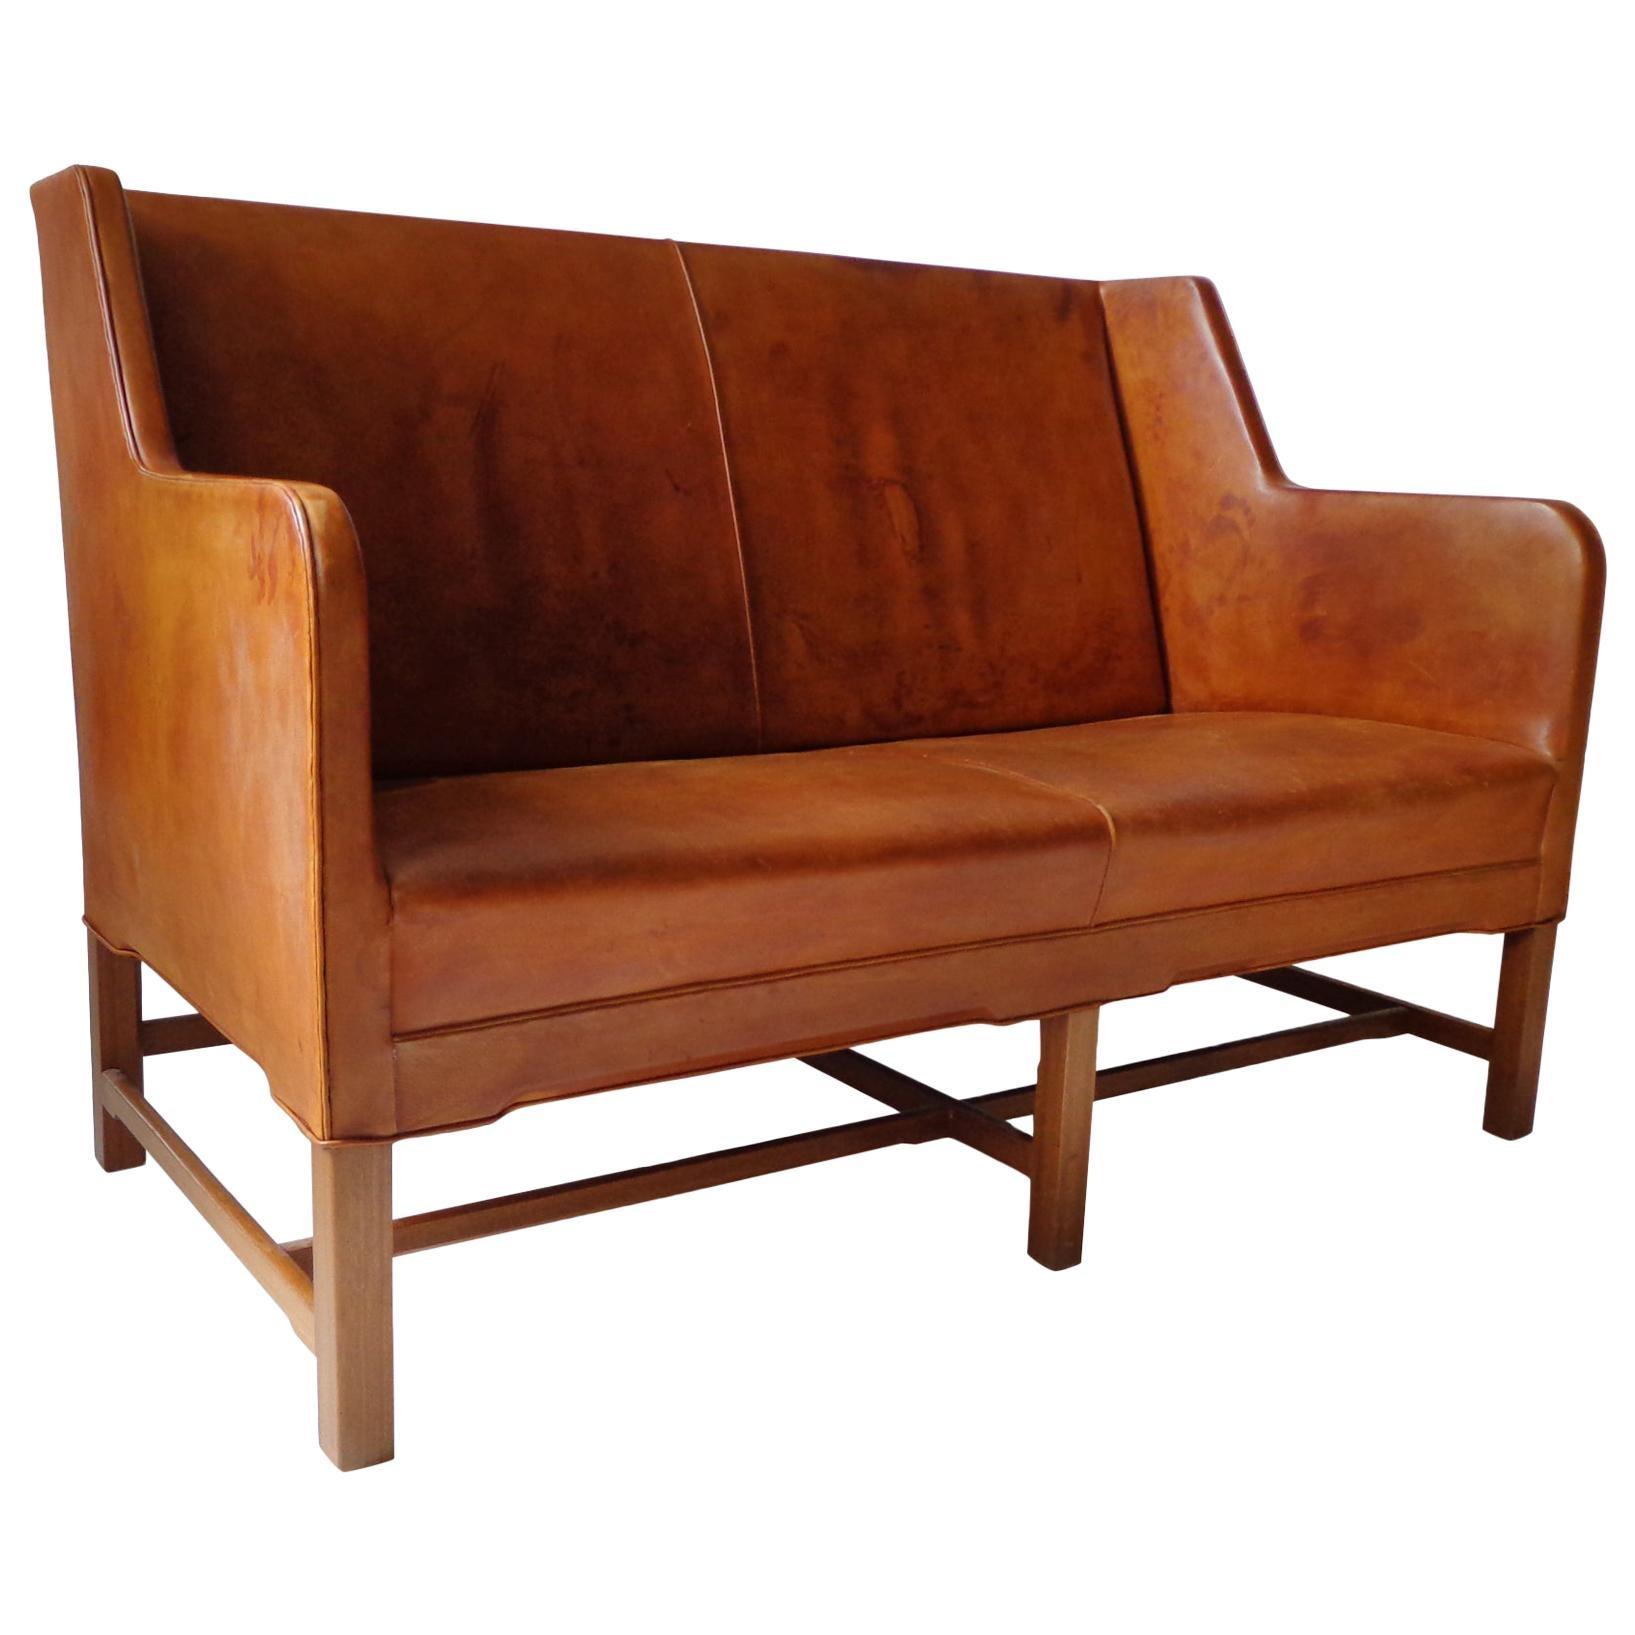 Sofa Model 5011 in Original Cognac Leather by Kaare Klint for Rud Rasmussen